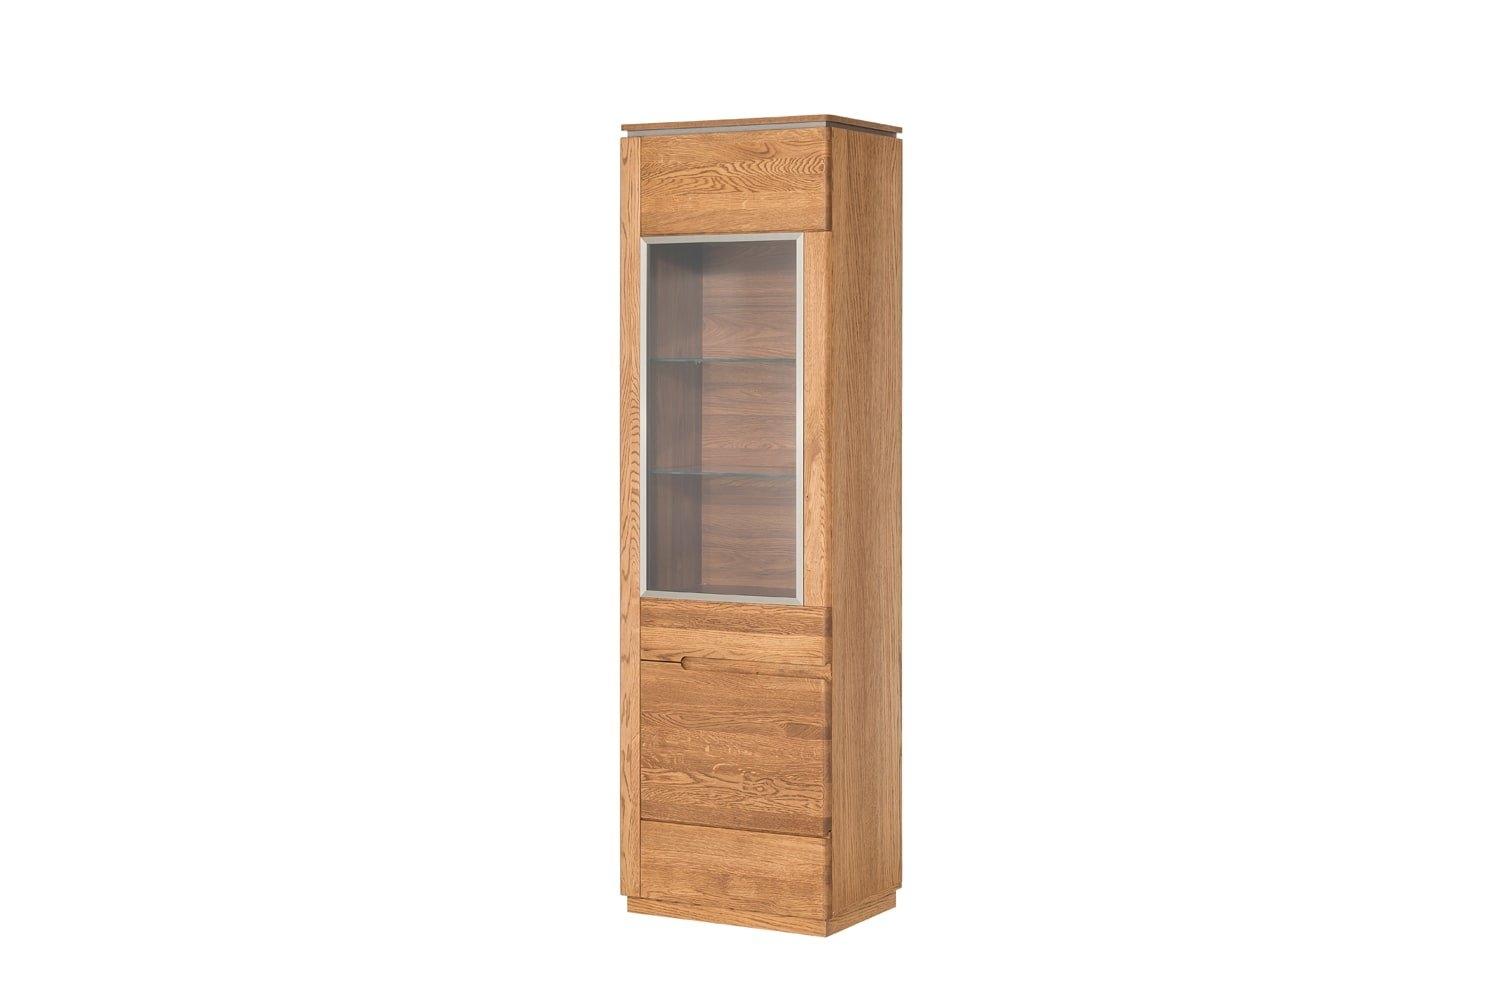 Vitrina din lemn si furnir, cu 1 usa Montenegro 11 Oak, l58xA42xH198 cm imagine